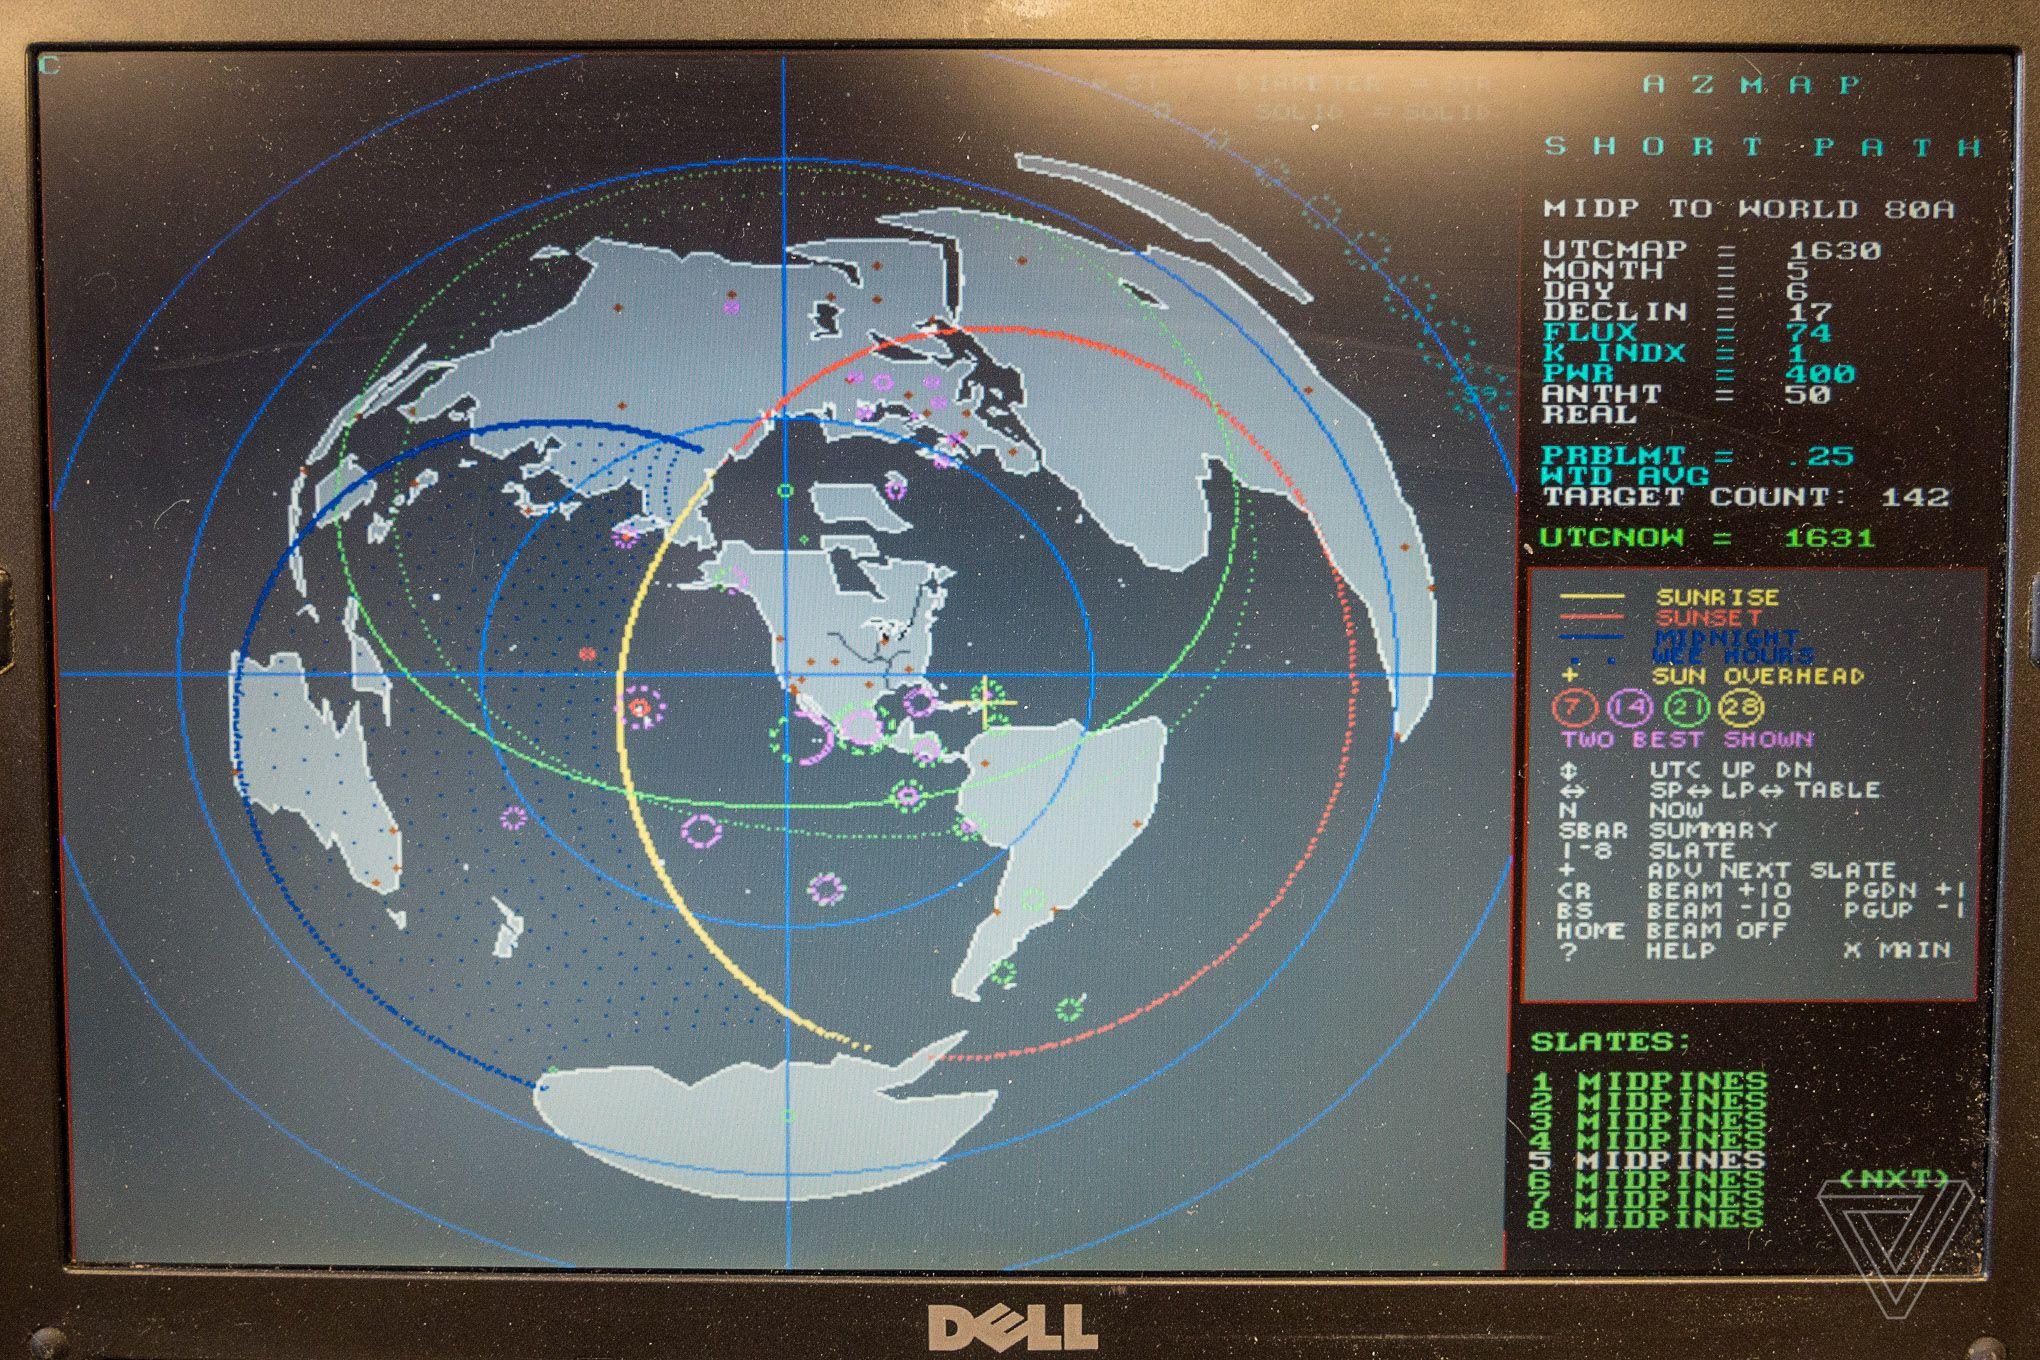 Alsup 的短波电台传送预测程序。Sarah Jeong 摄 / The Verge